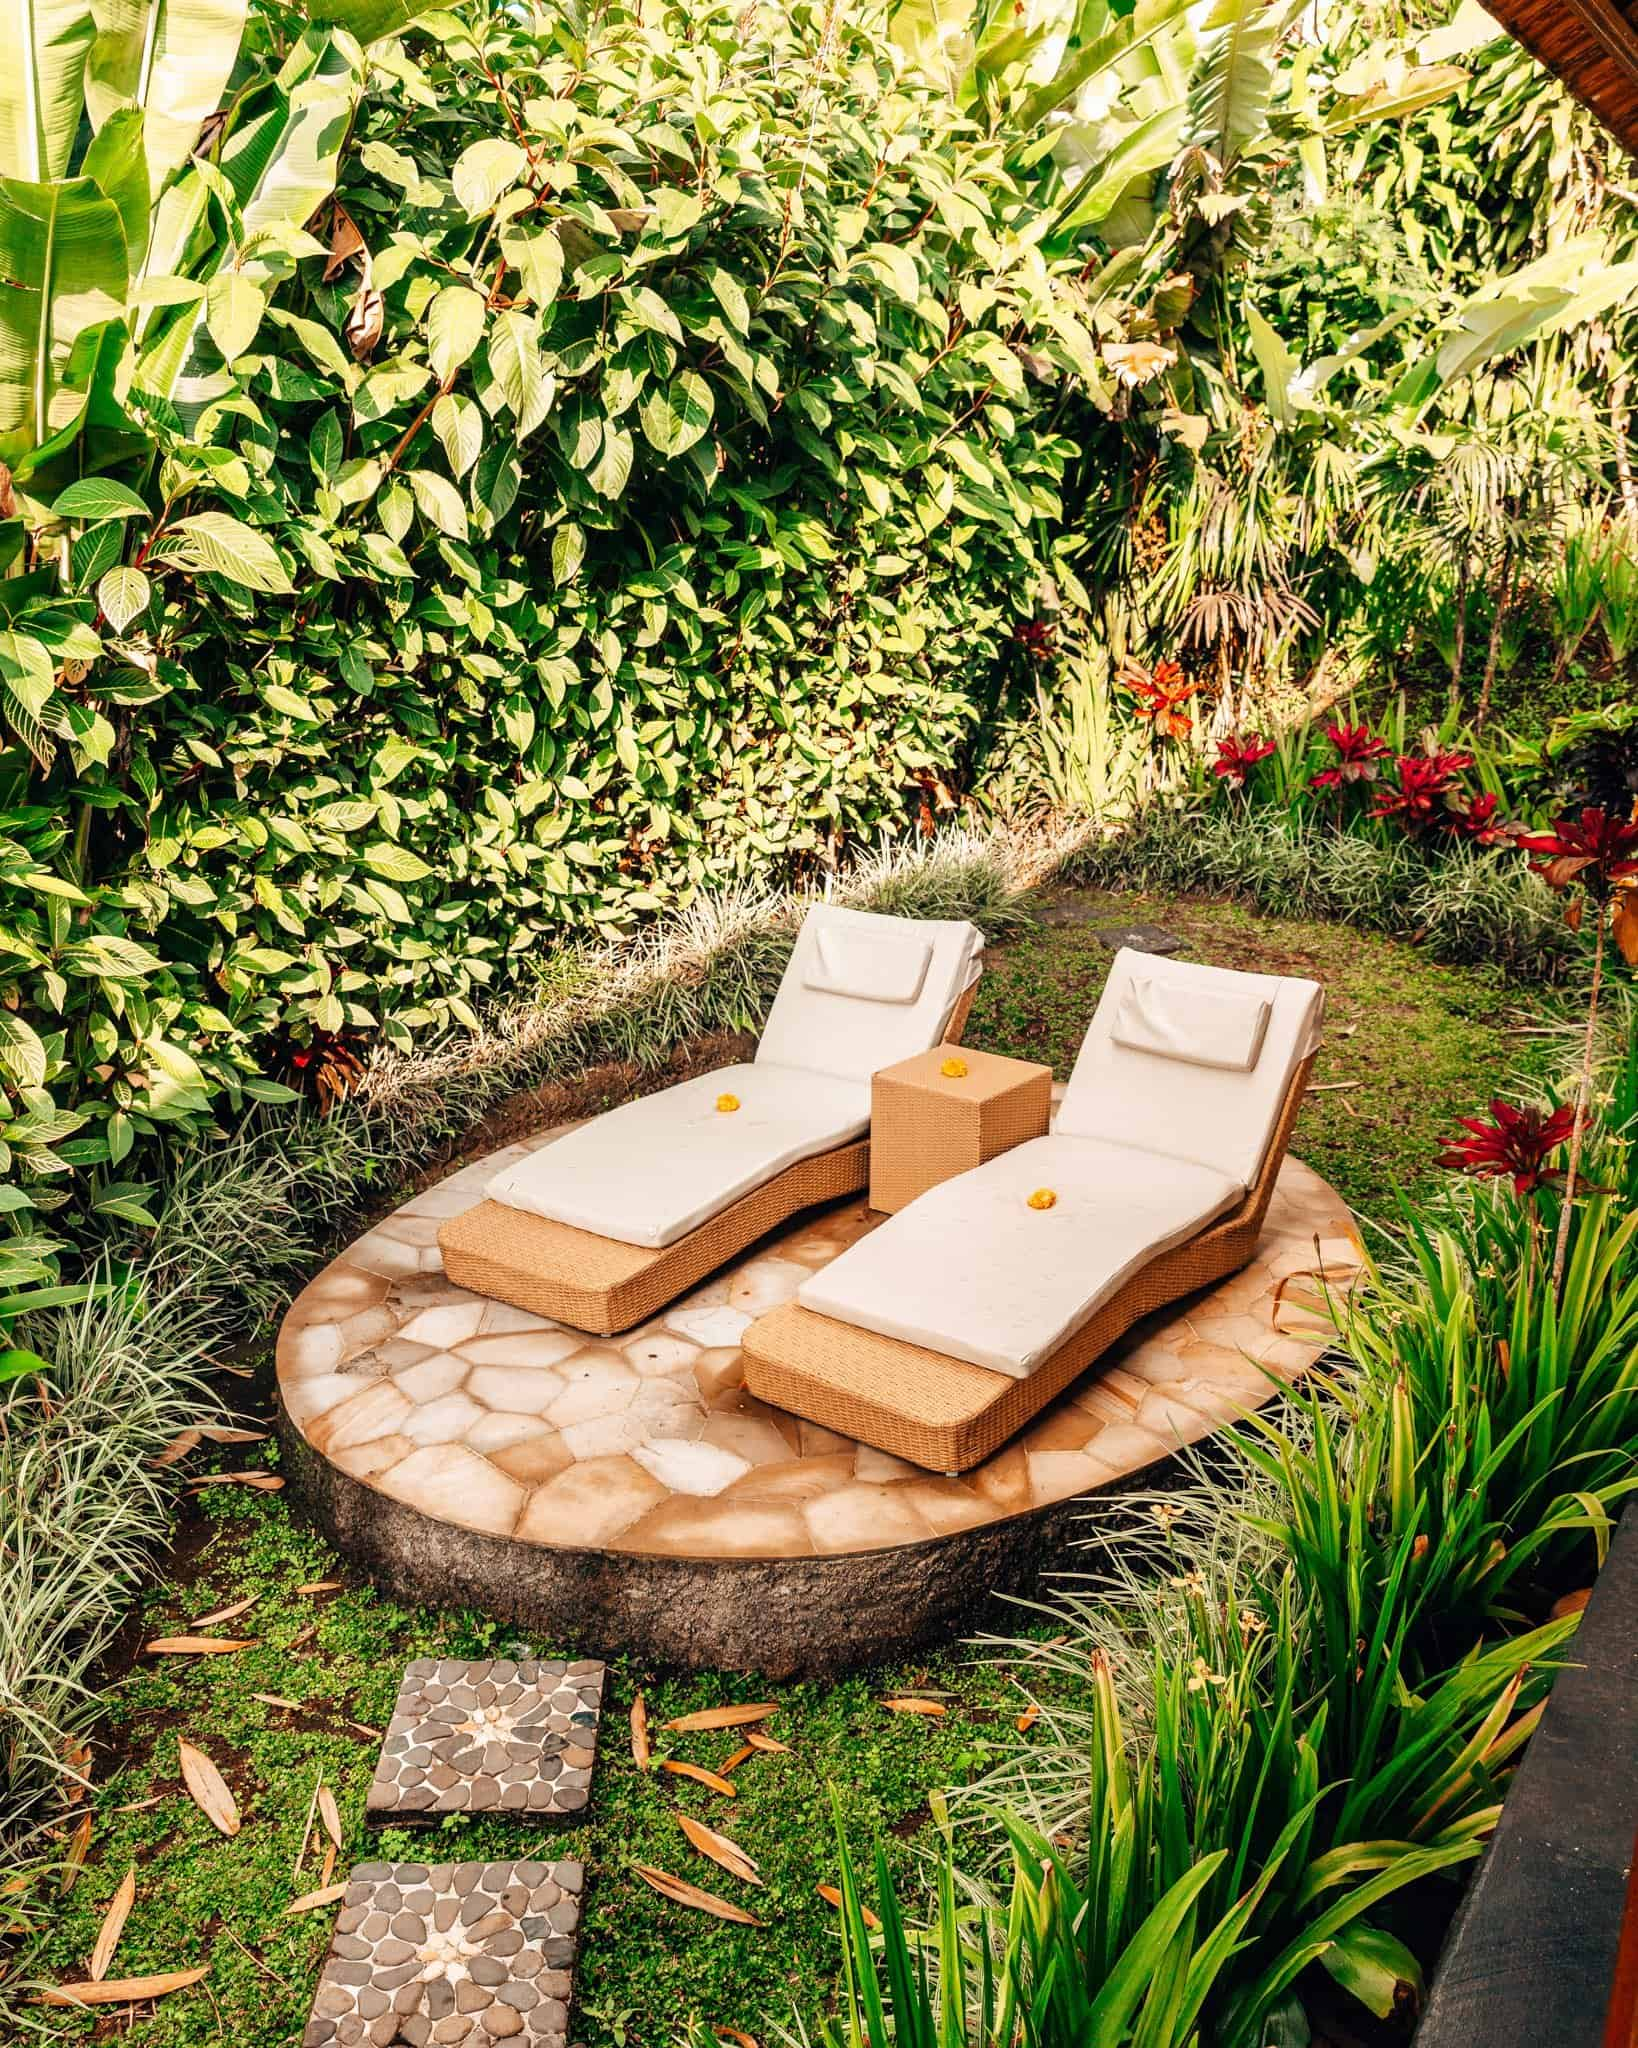 Outdoor Relaxing Area at Munduk Moding Plantation Bali - The Next Trip